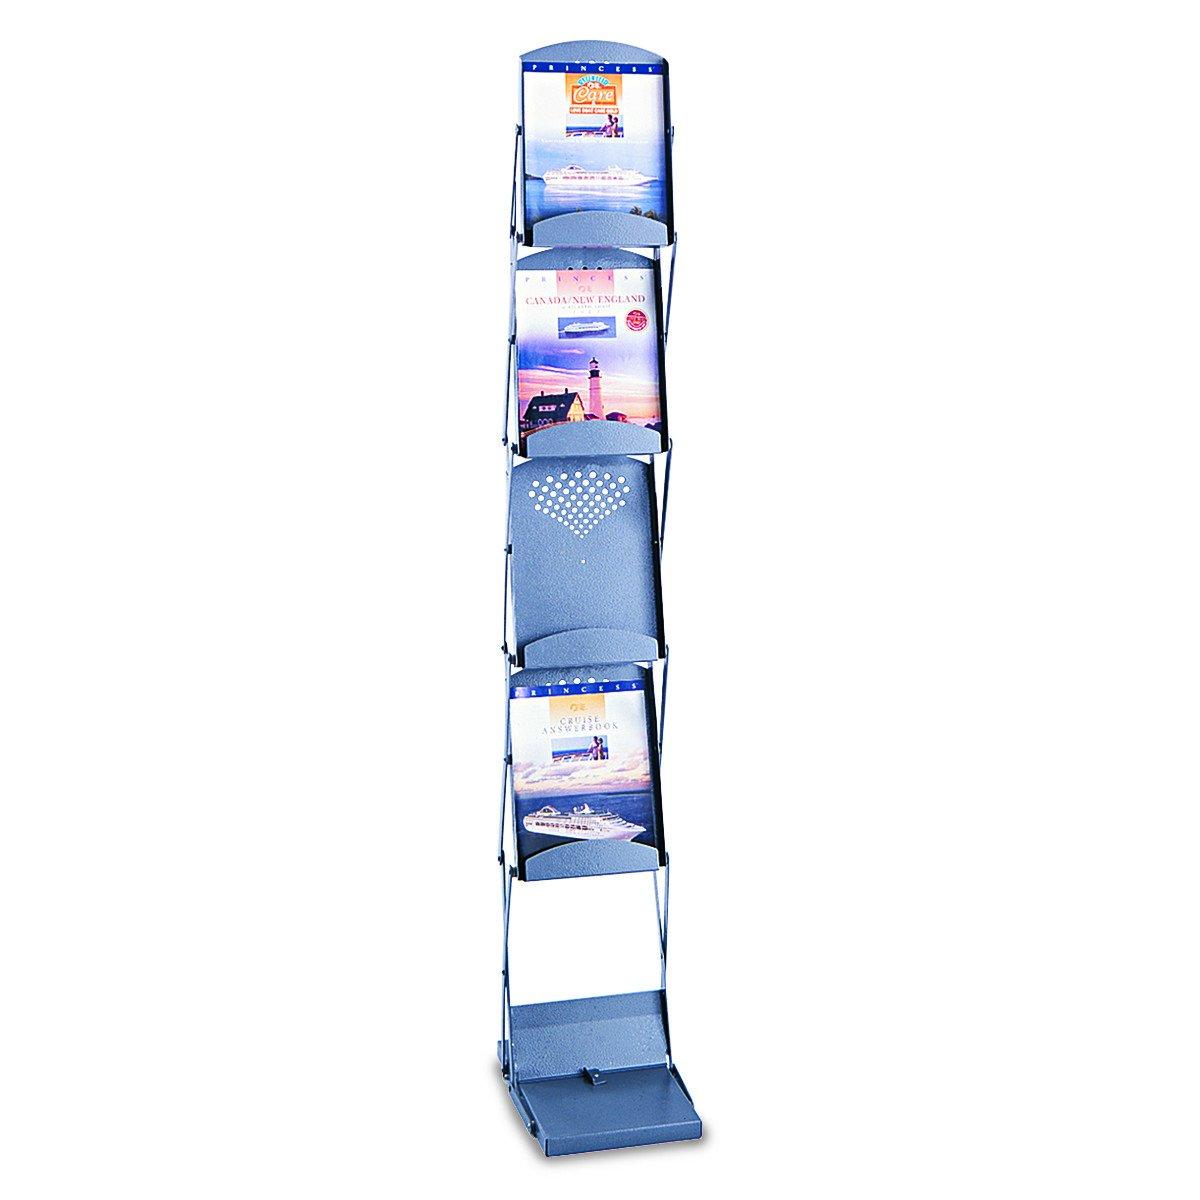 Safco 4132GR Portable Folding Literature Display, 10w x 13-1/4d x 56h, Metallic Gray